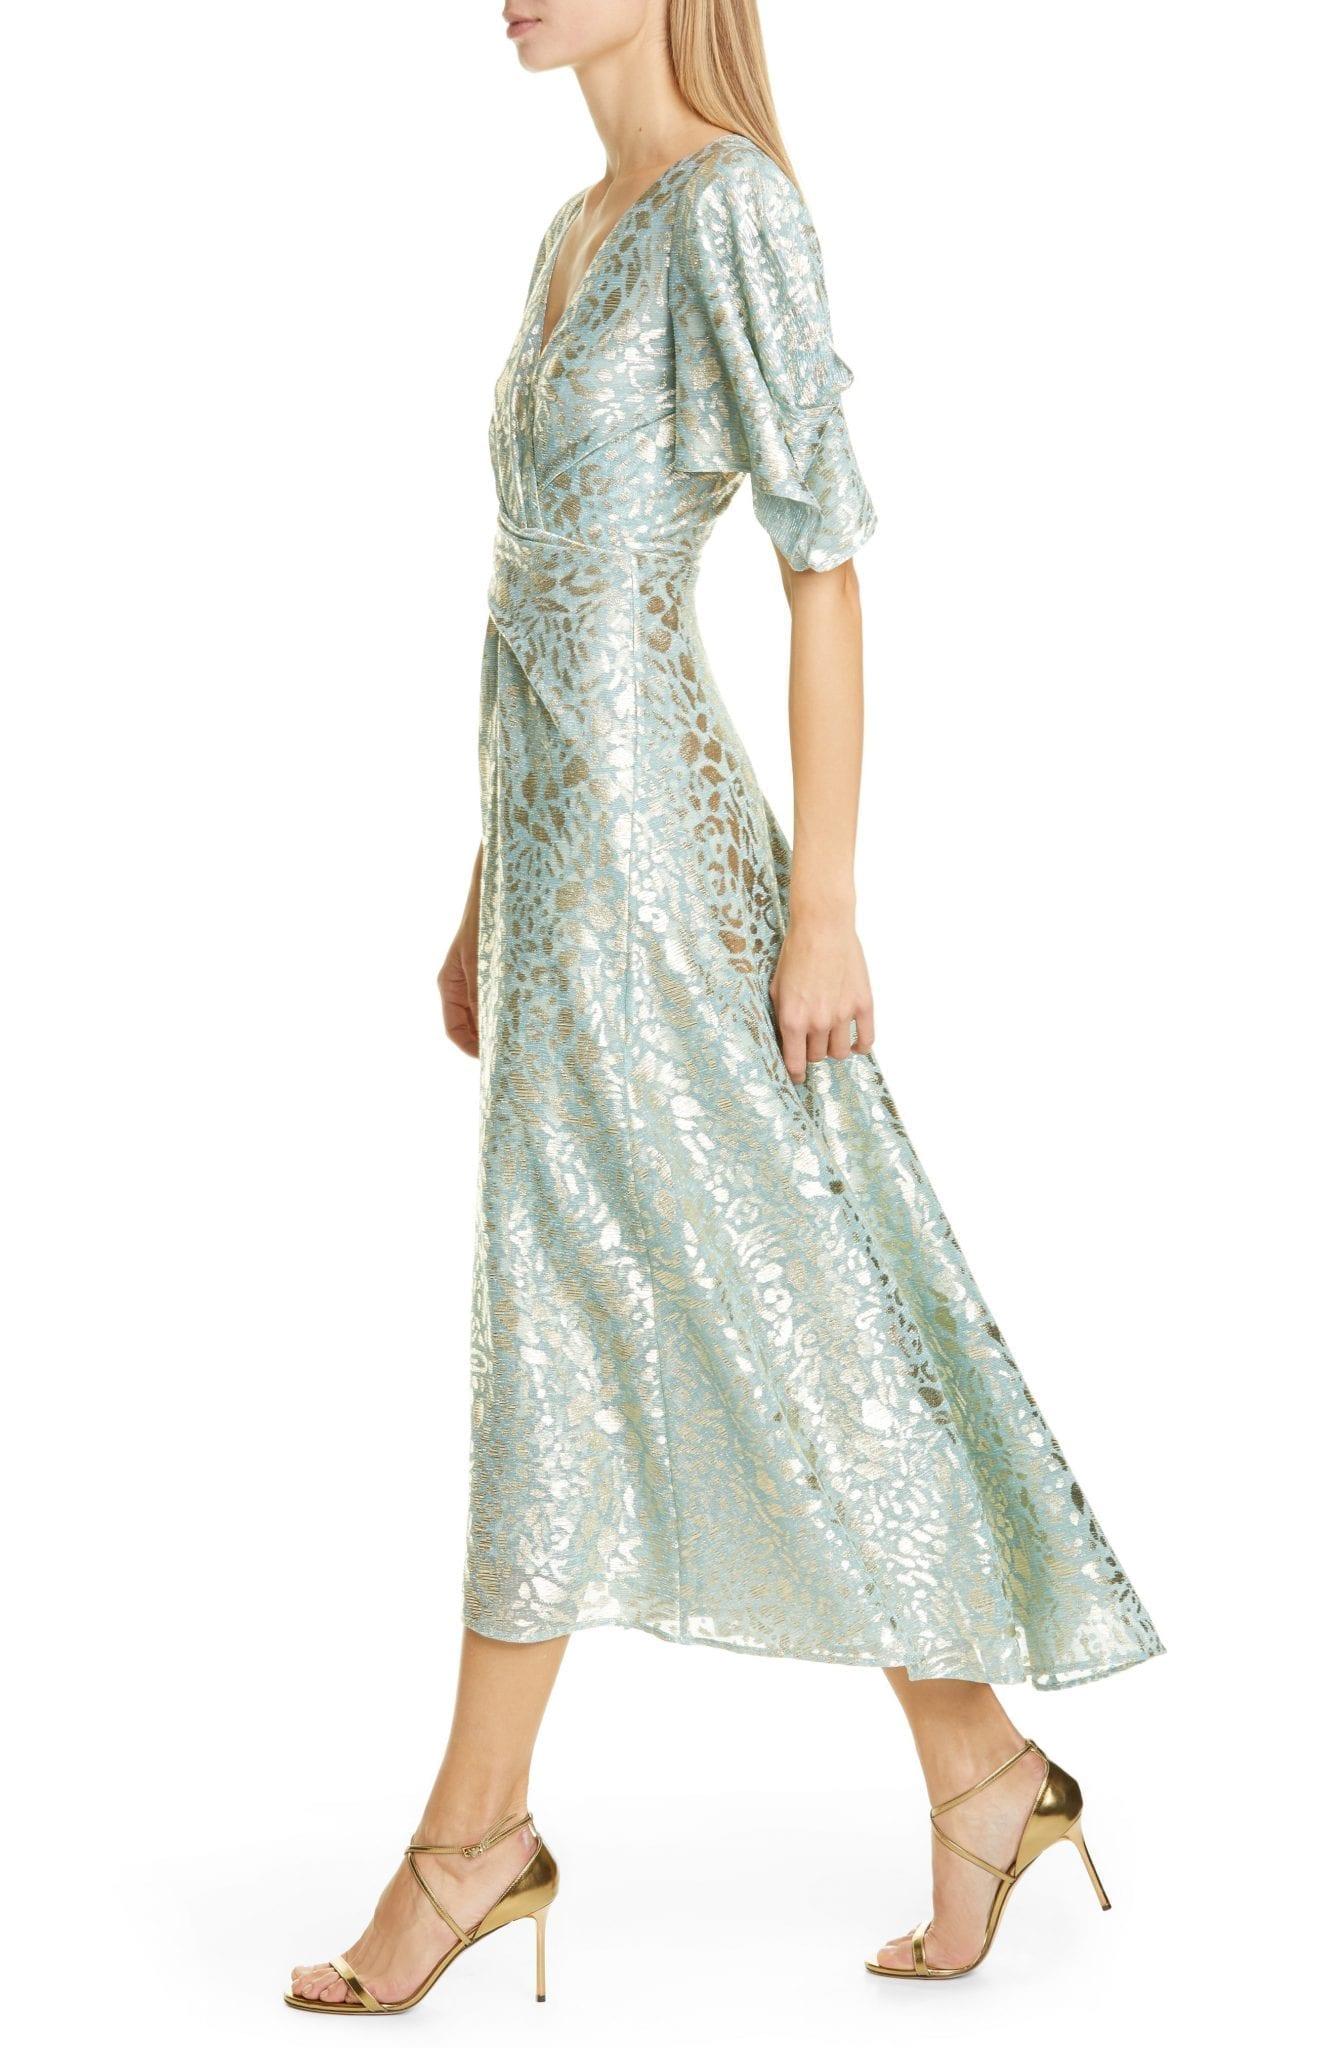 TALBOT RUNHOF Metallic Animal Spot Voile Midi Dress